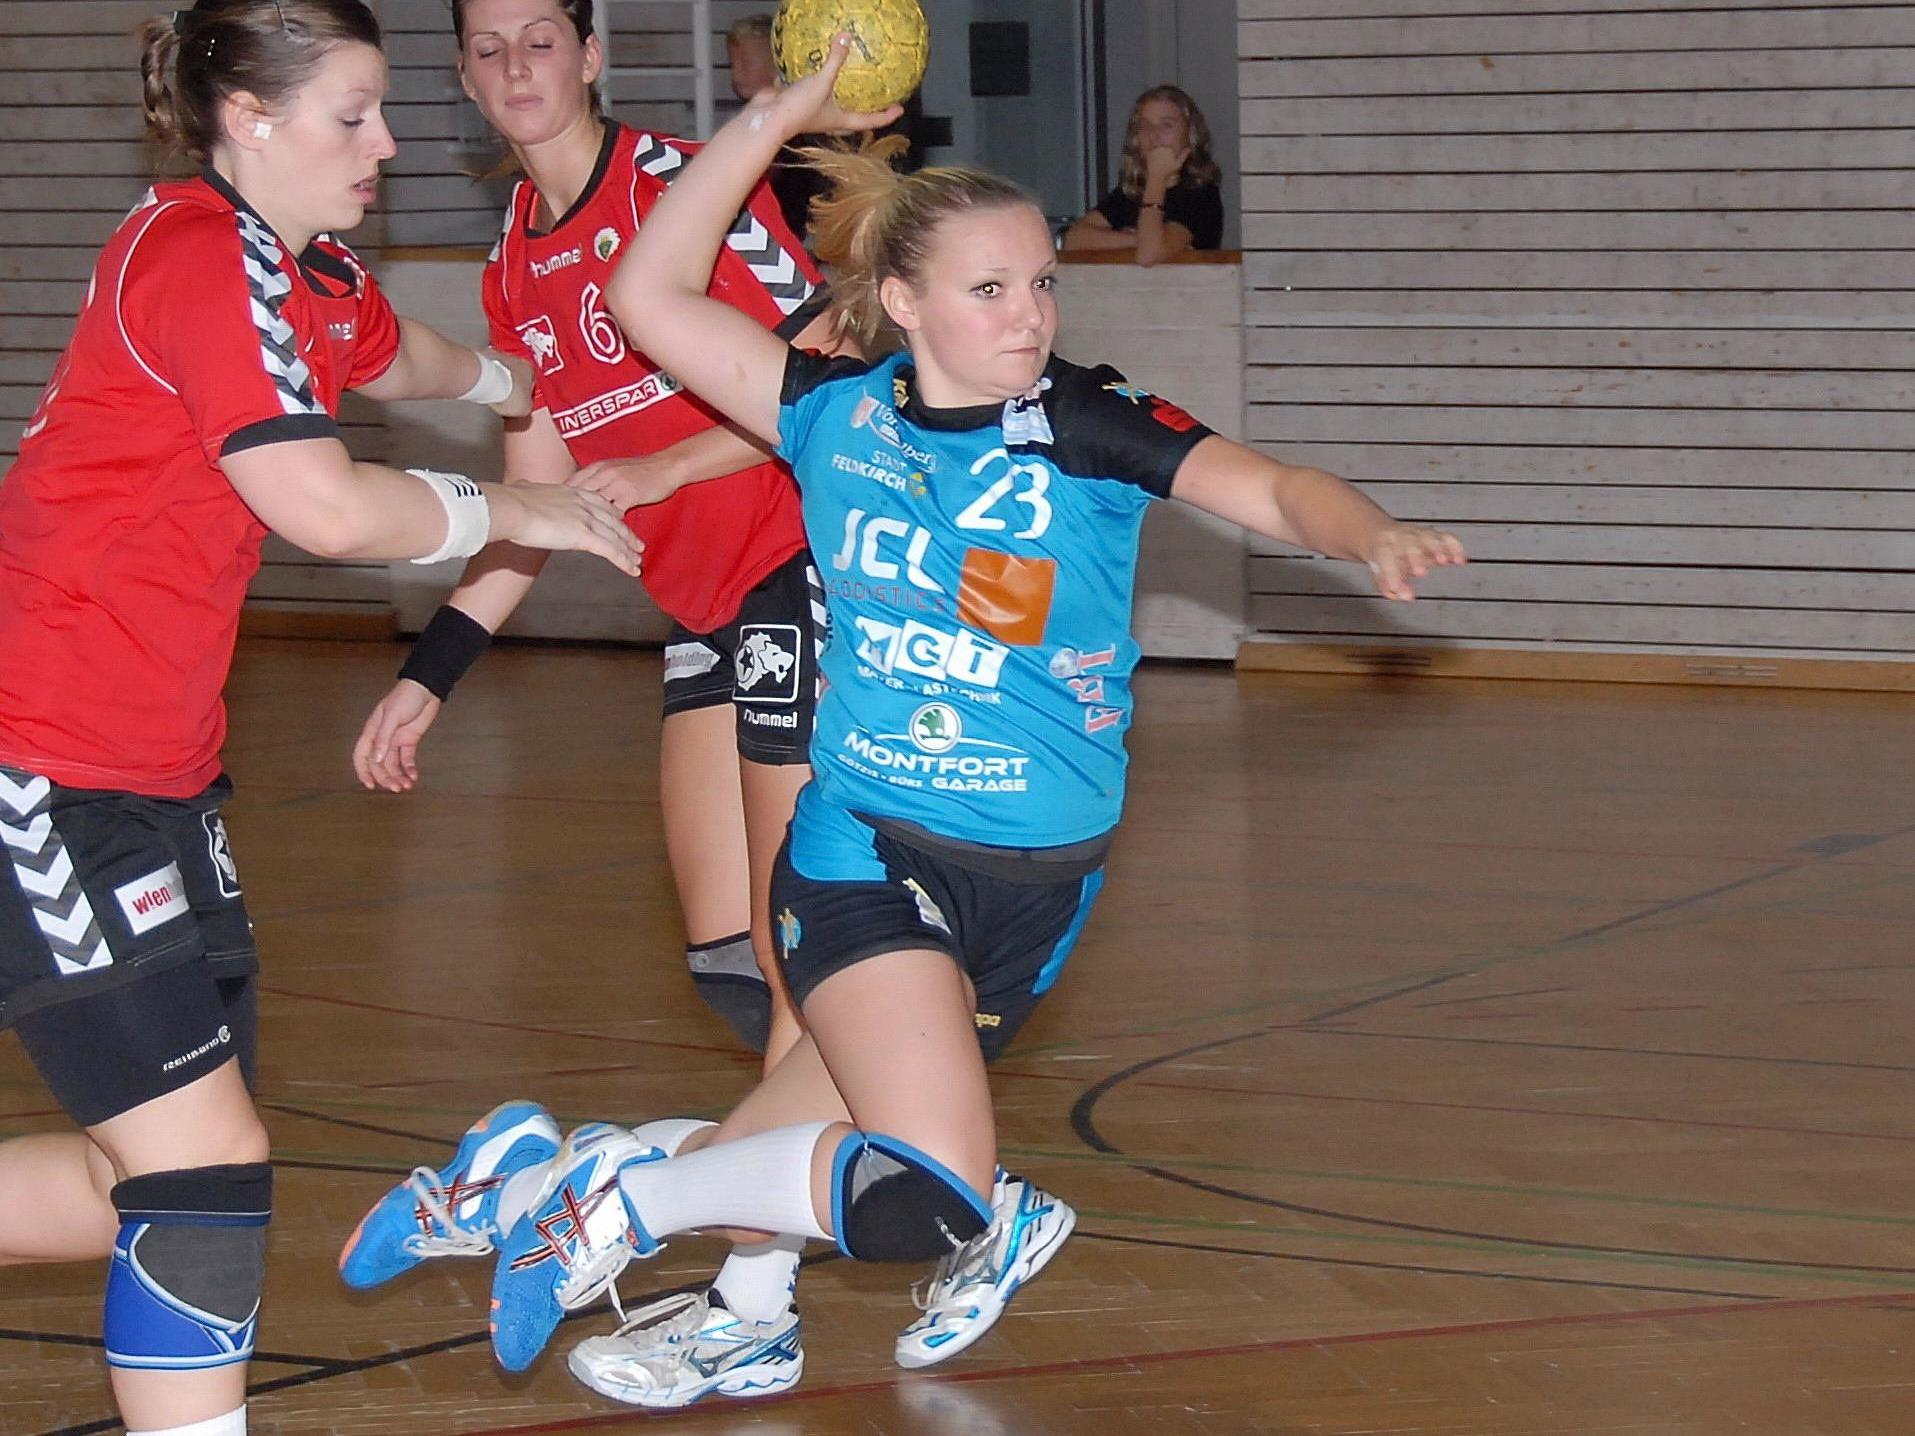 Feldkirchs Handballdamen gewinnen das Heimspiel gegen MGA Fivers mit sechs Toren Differenz.